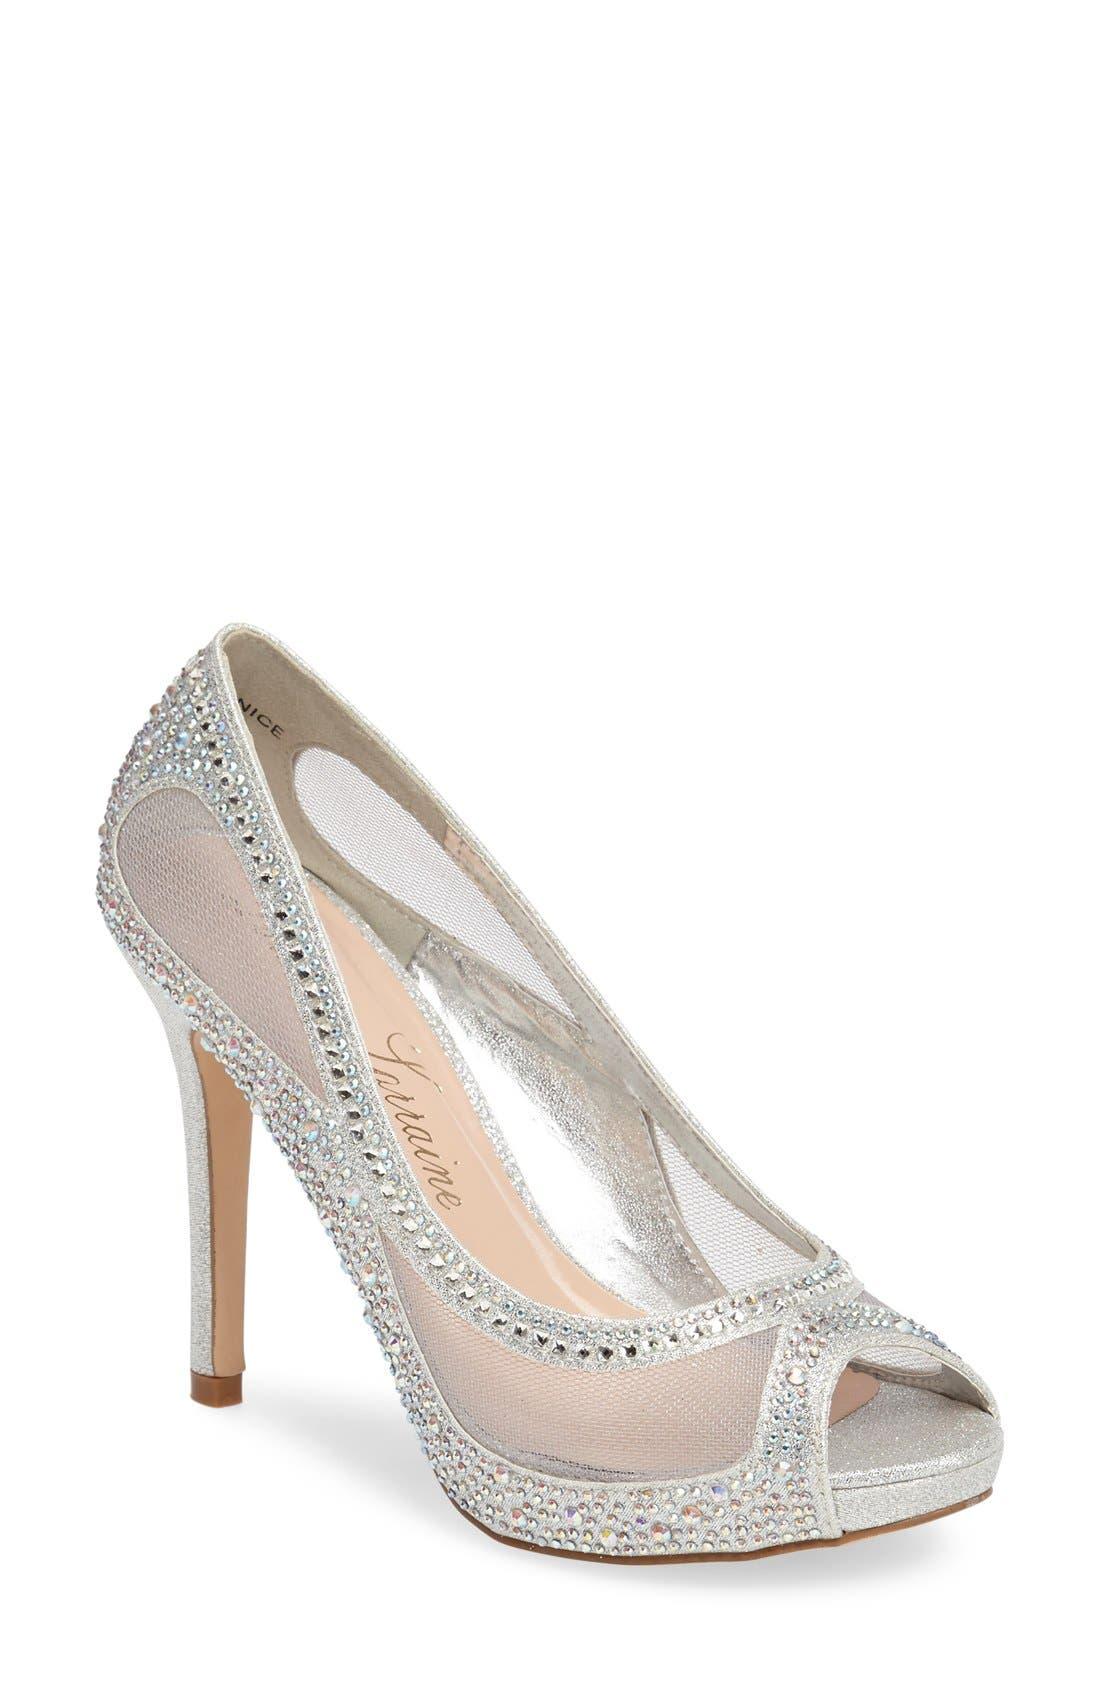 Lauren Lorraine Bernice Peep Toe Crystal Embellished Pump (Women)